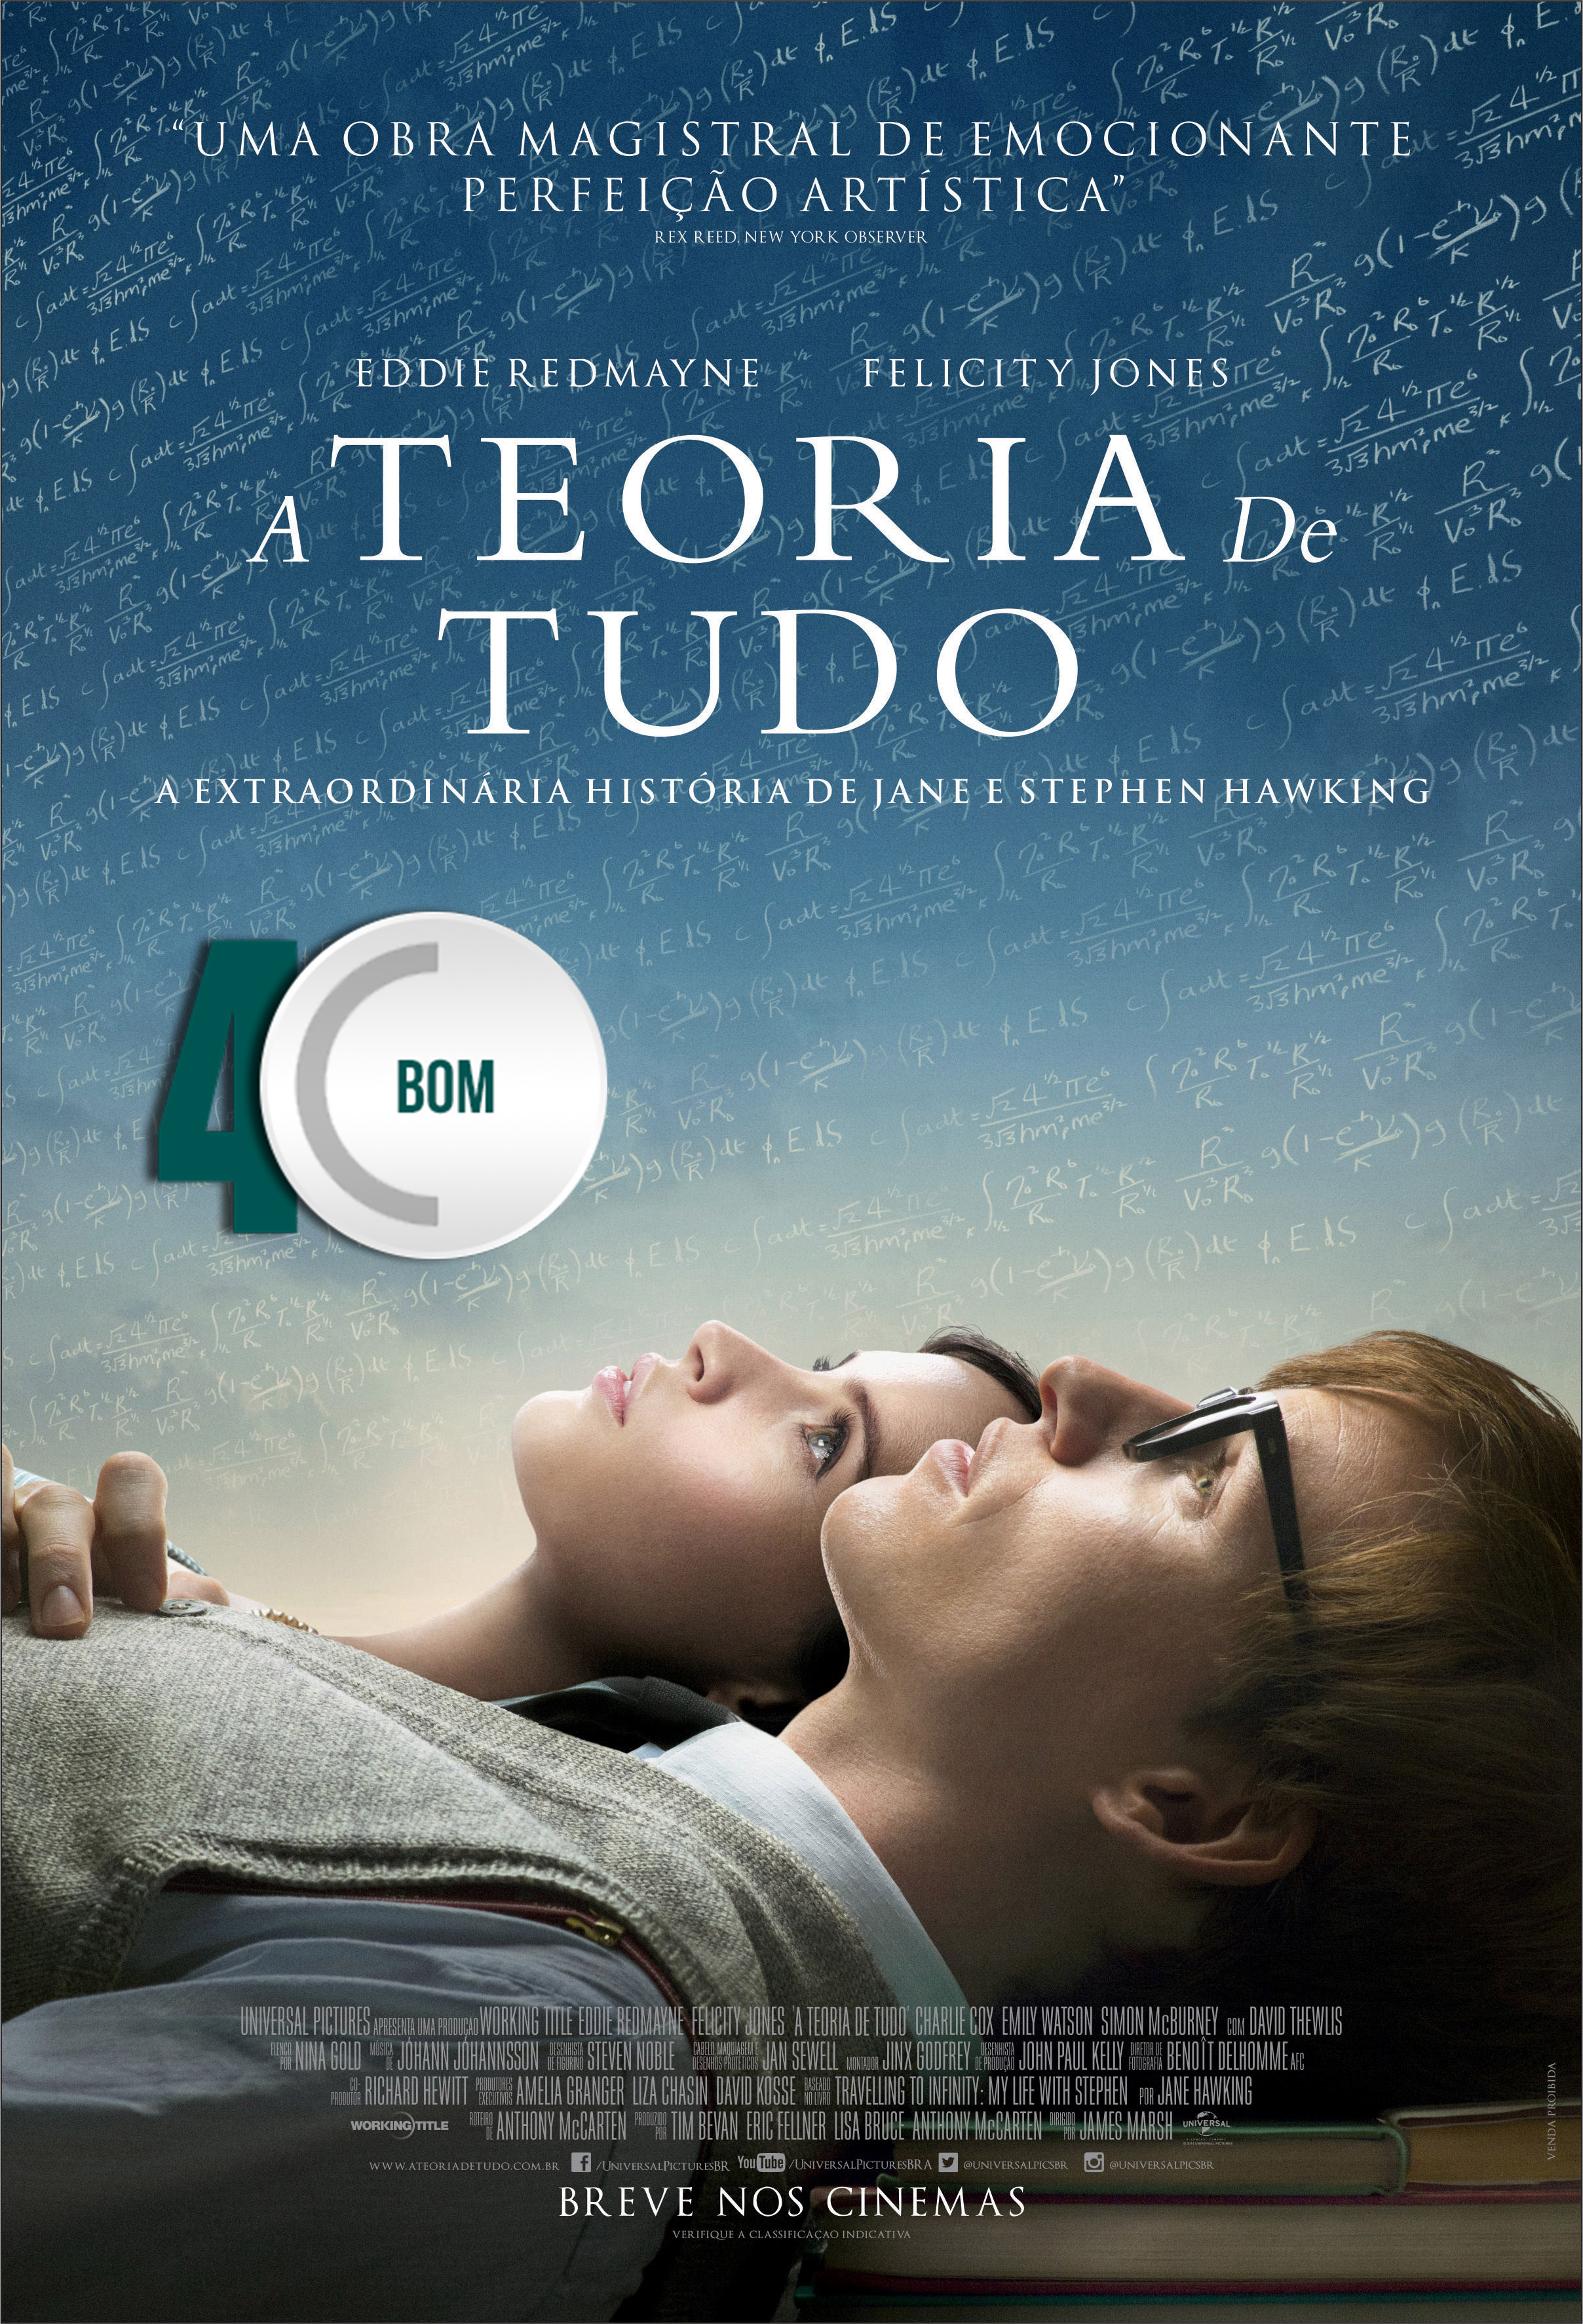 A-TEORIA-DE-TUDO-